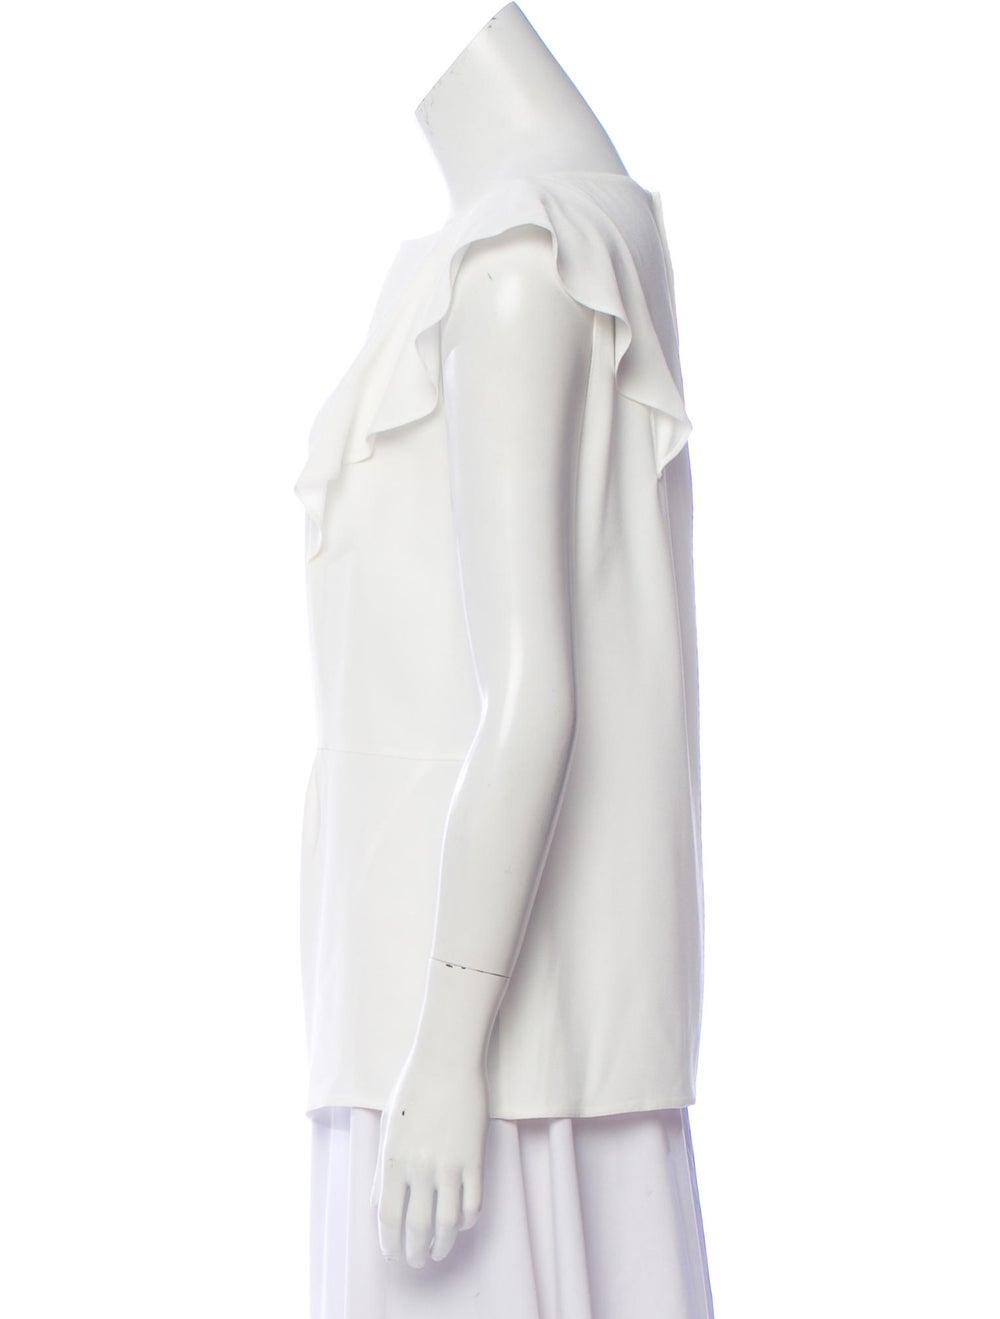 Prada Woven Ruffle-Accented Blouse White - image 2